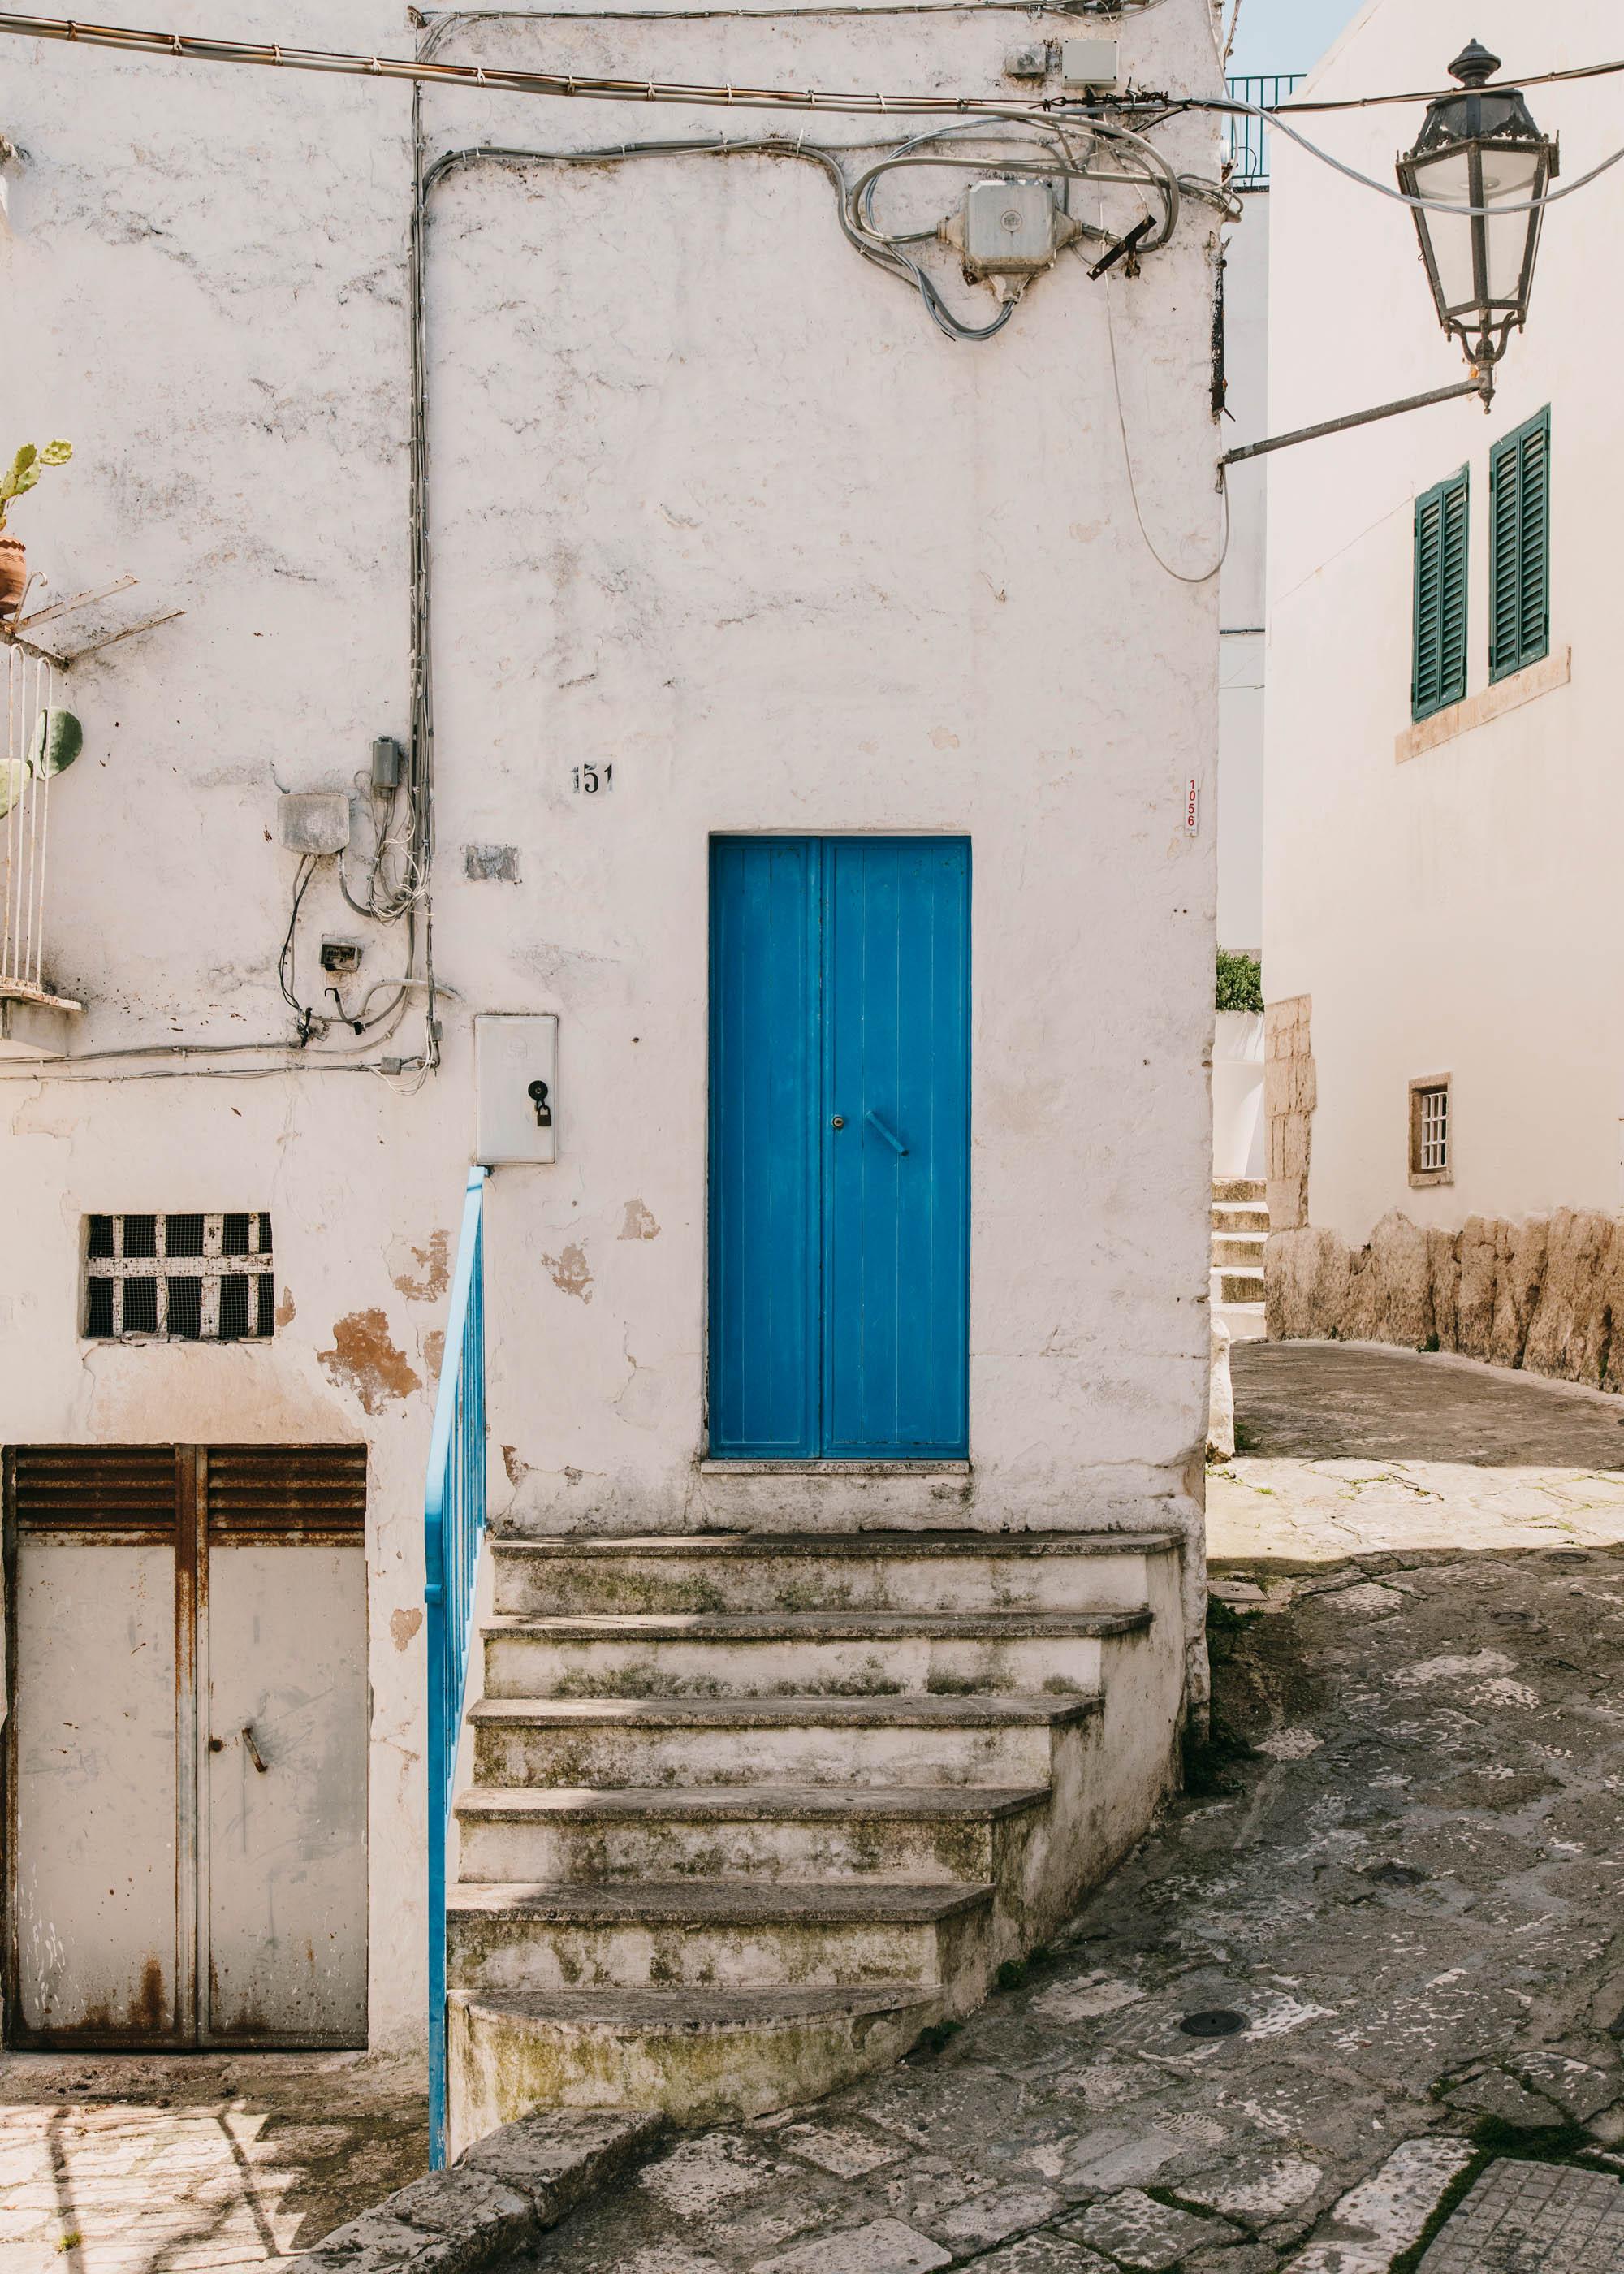 #editorial #italy #puglia #ostuni #masseria #morosseta #openhouse #blue